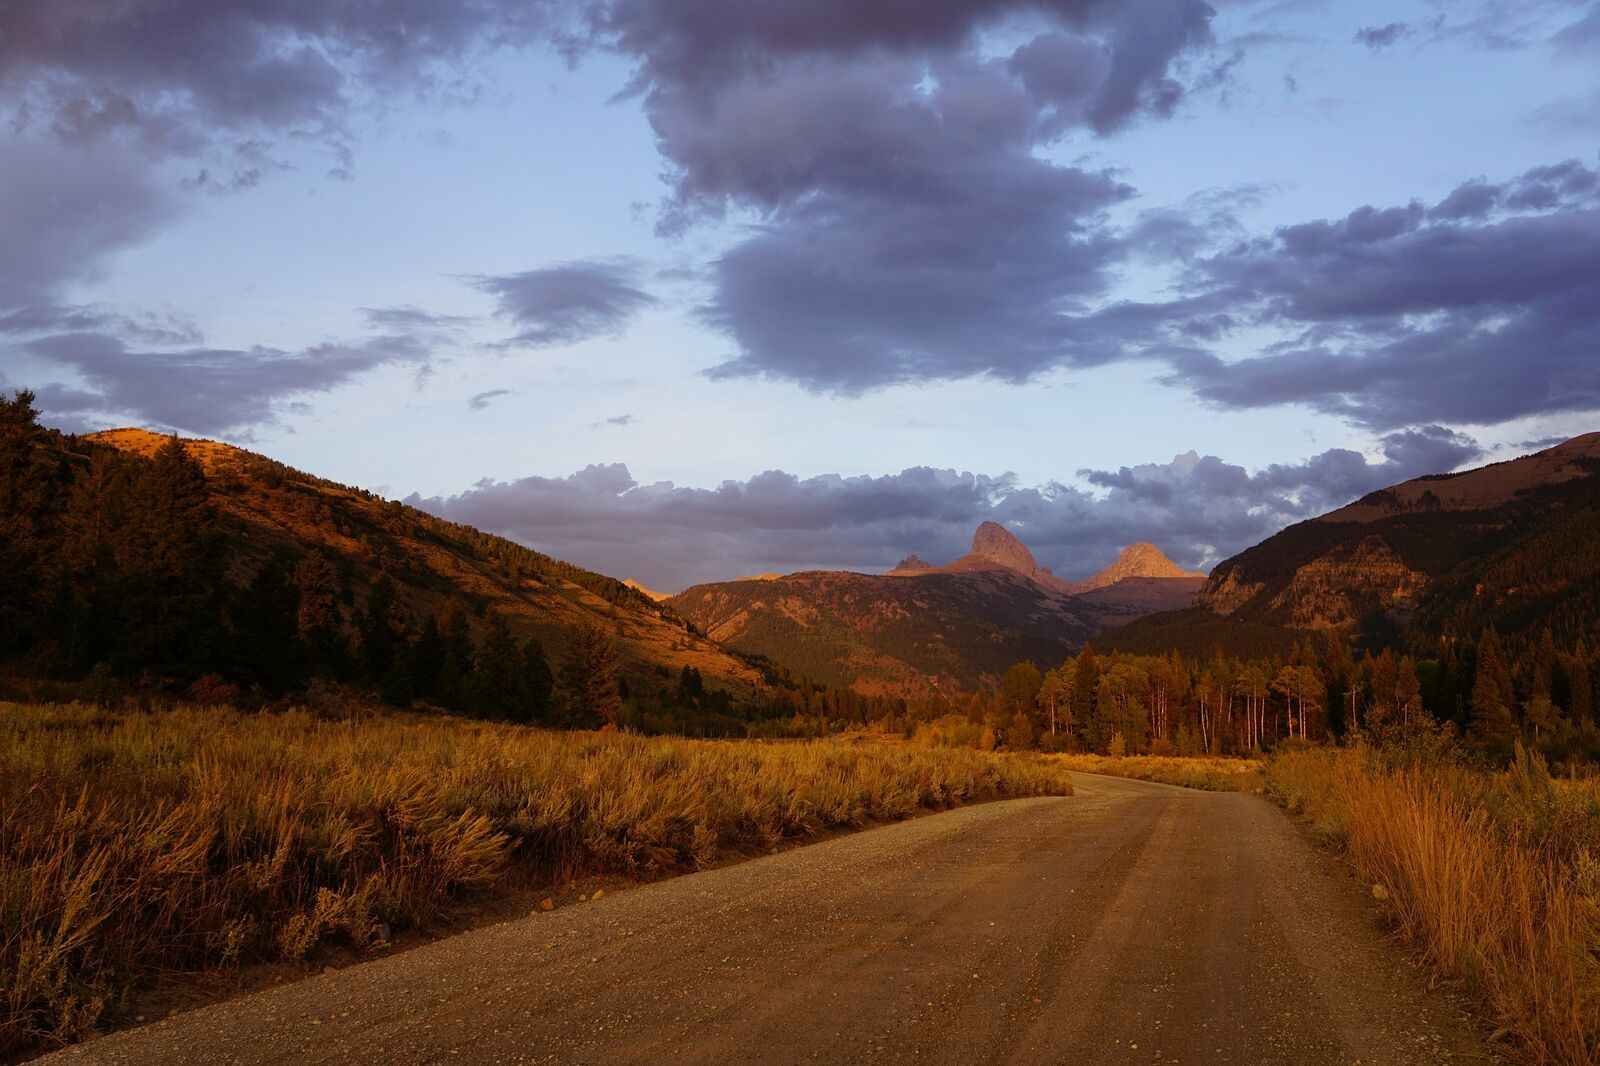 roadway during the fall season